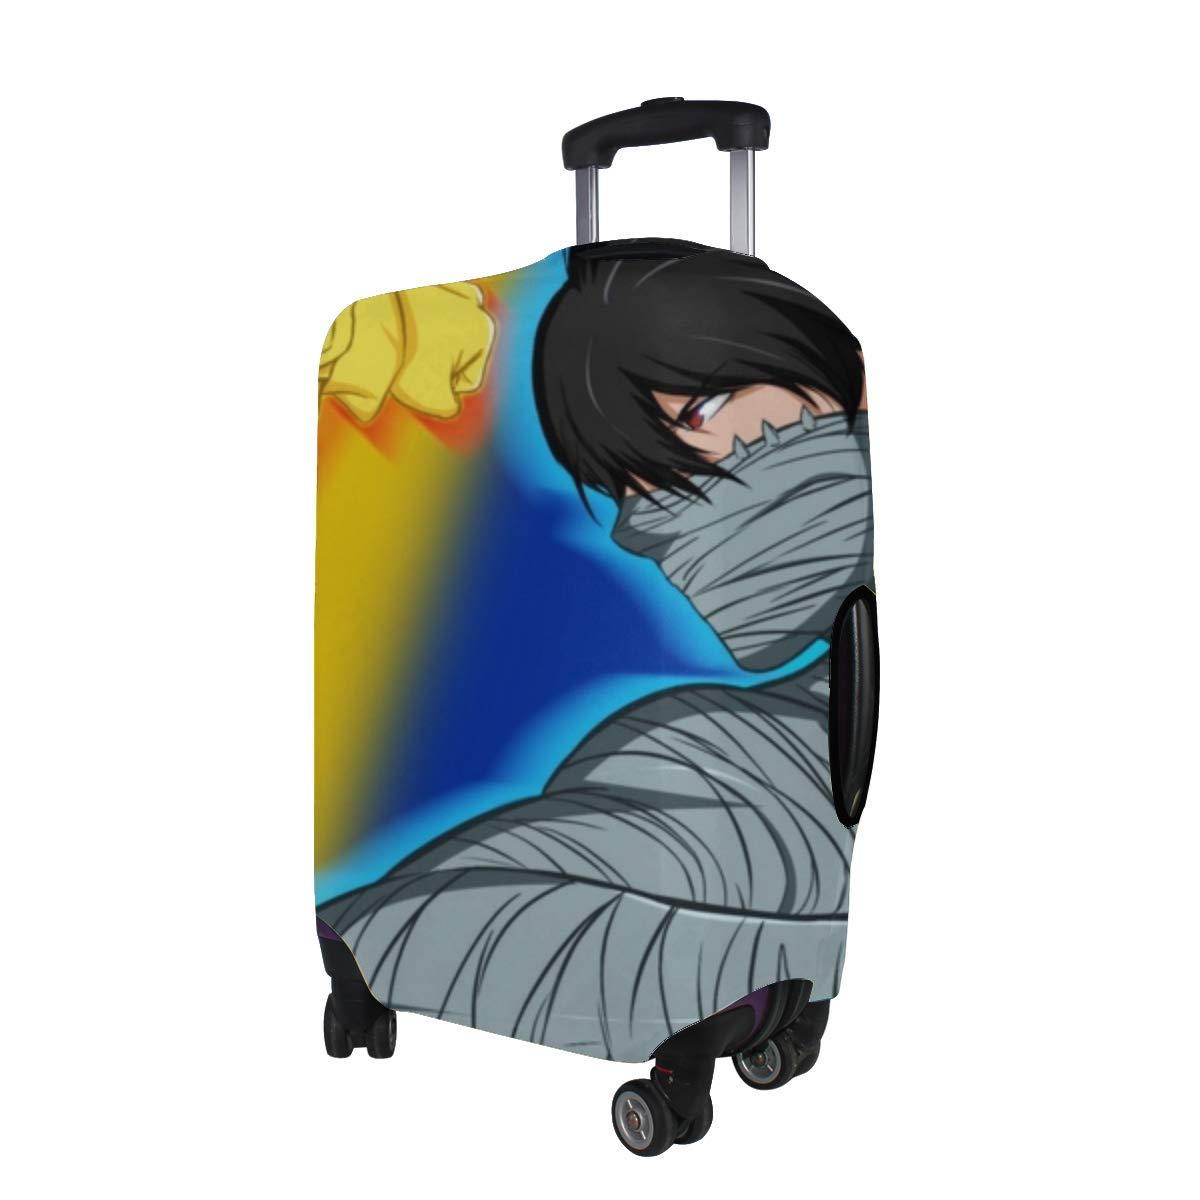 Maxm Bleach Naruto Naruto Vs Ichigo Crossover Naruto Shippuden Pattern Print Travel Luggage Protector Baggage Suitcase Cover Fits 18-21 Inch Luggage